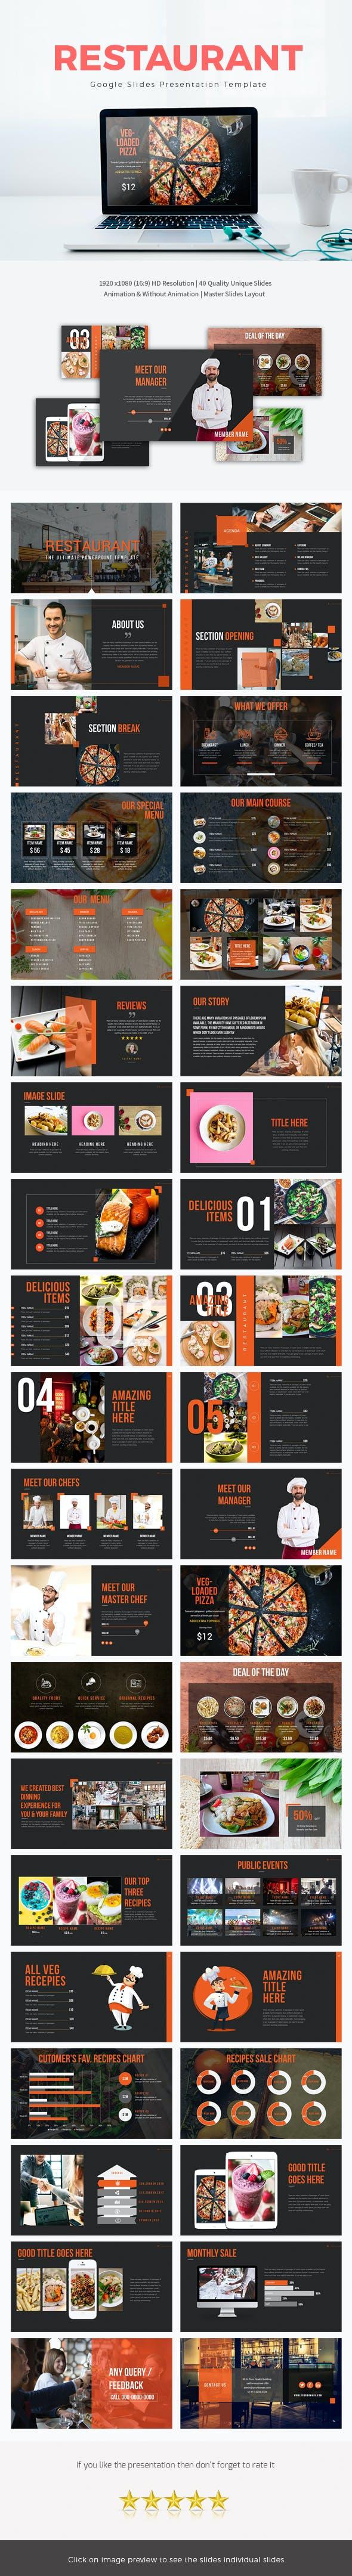 restaurant google slide presentation template by rasignature